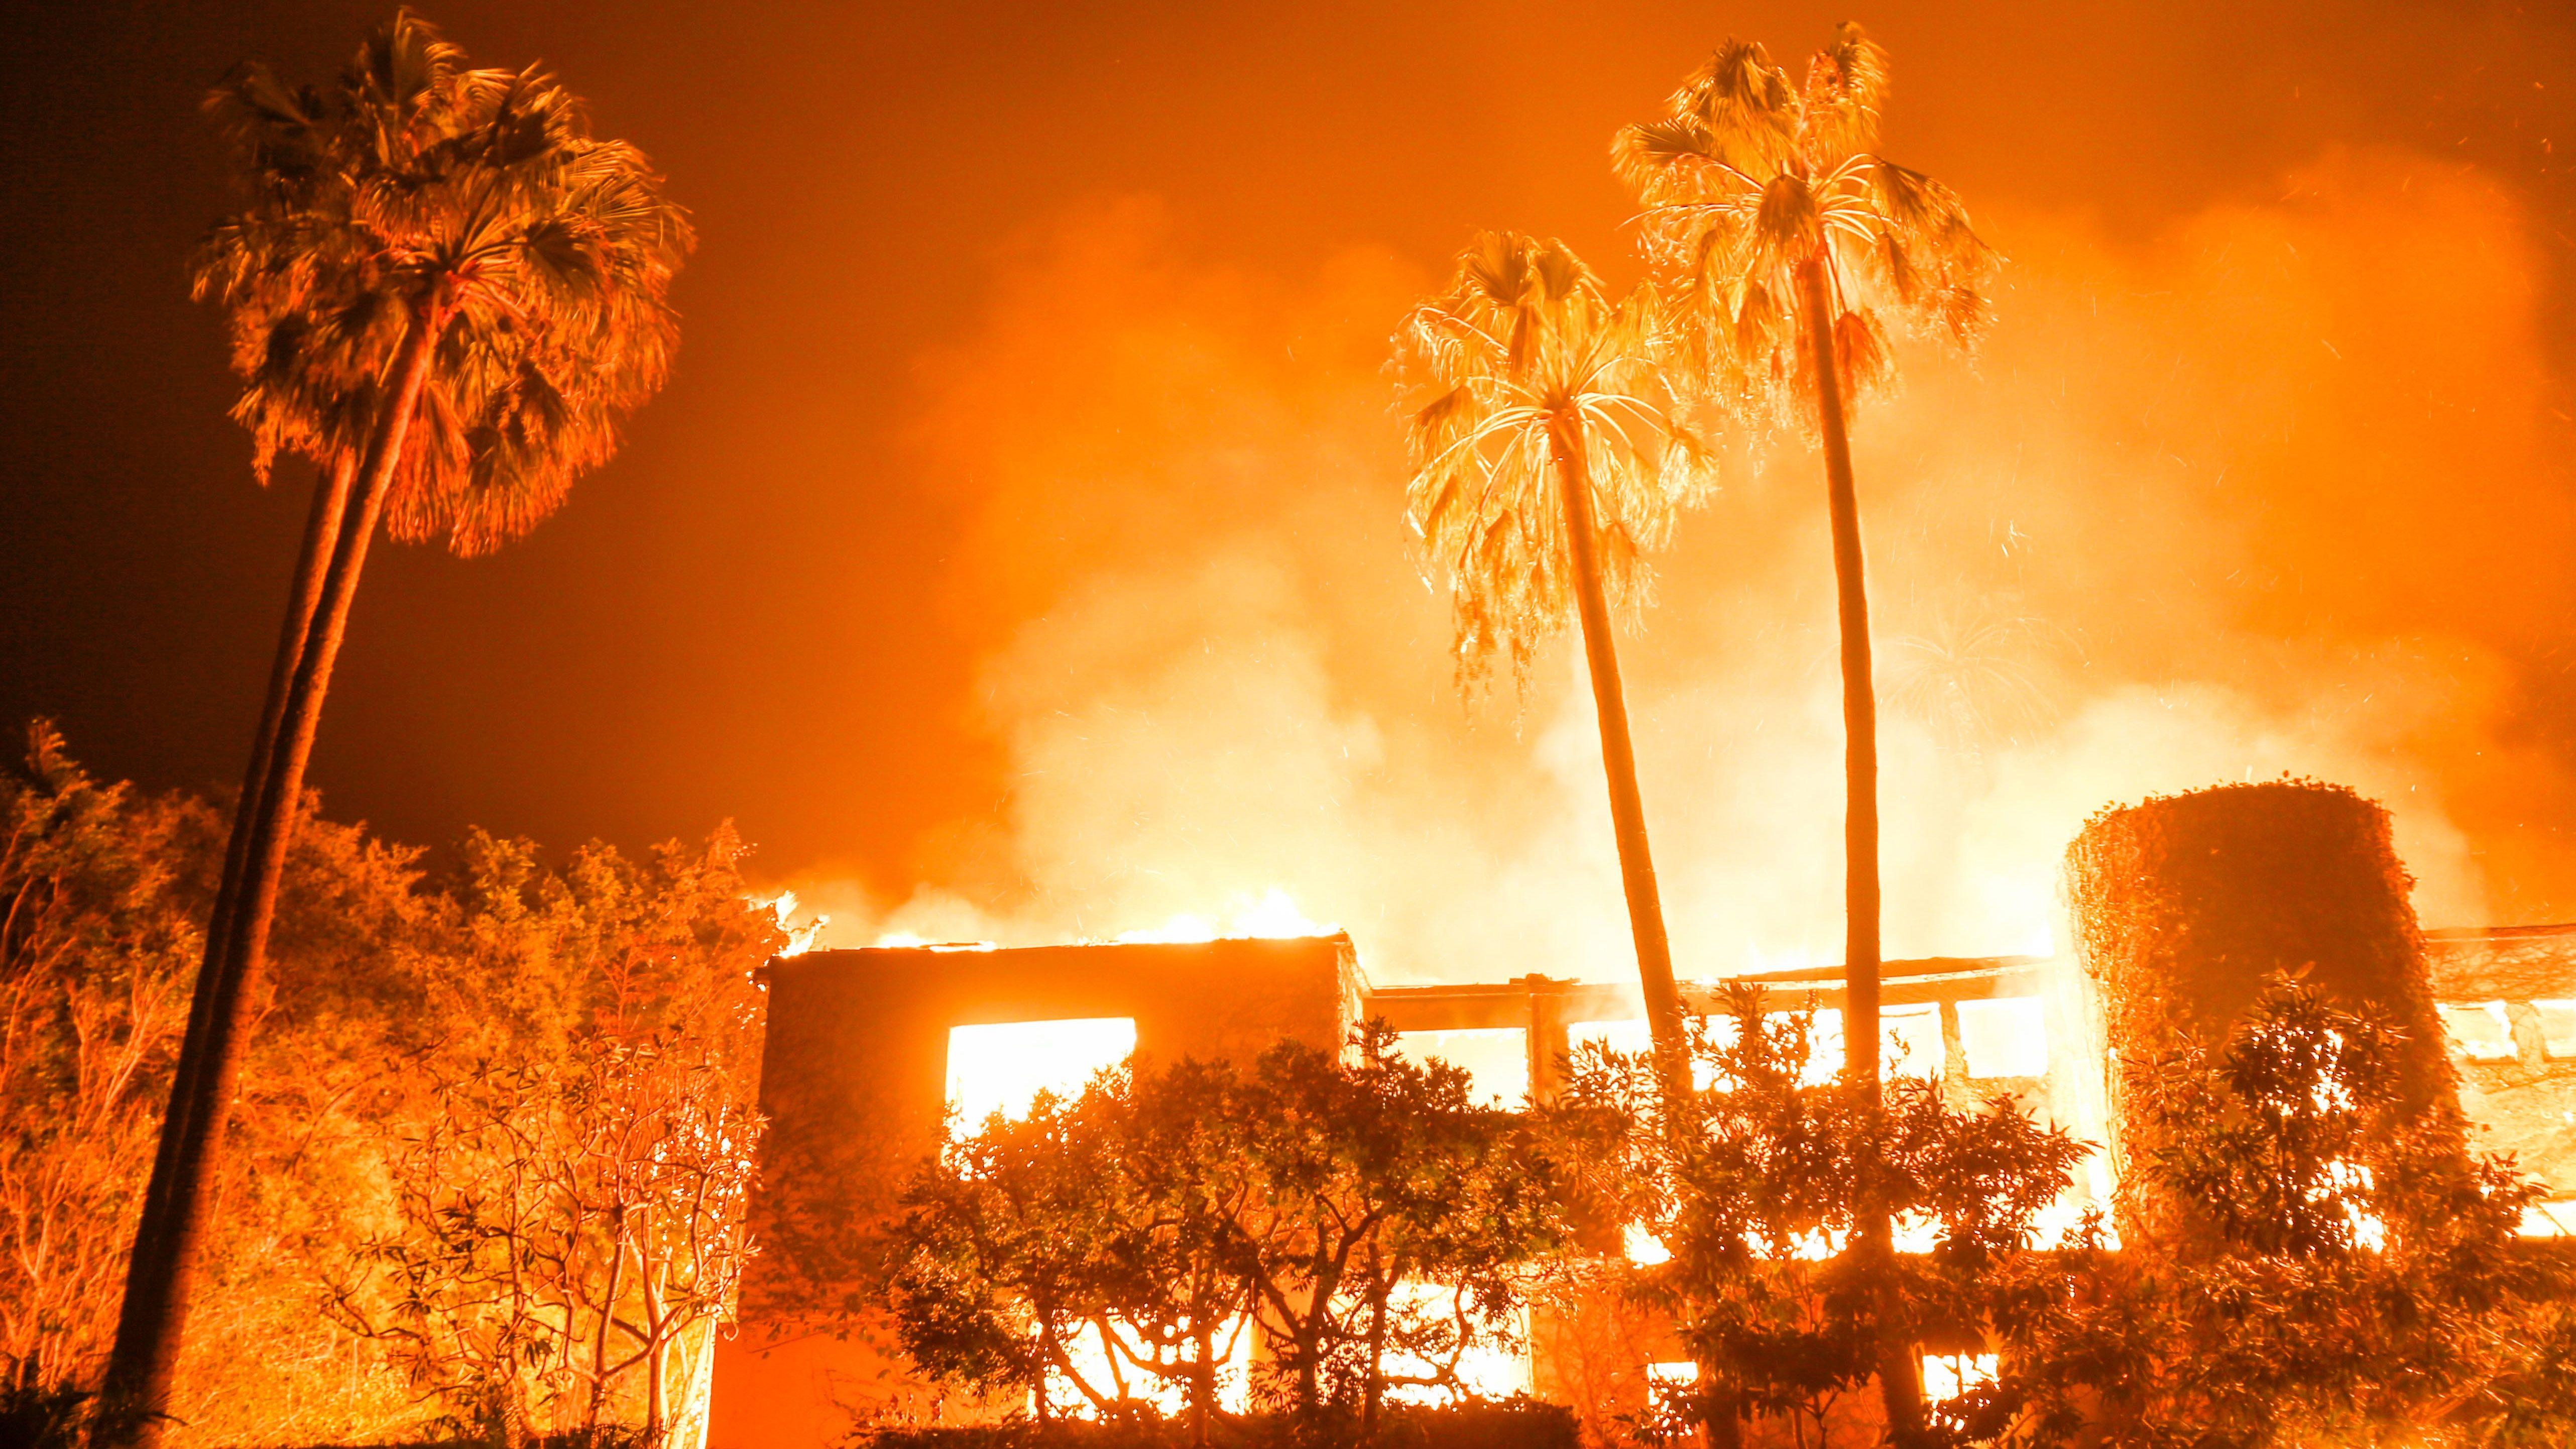 The Woolsey fire burns homes in Malibu, Calif., Friday, Nov. 9, 2018.